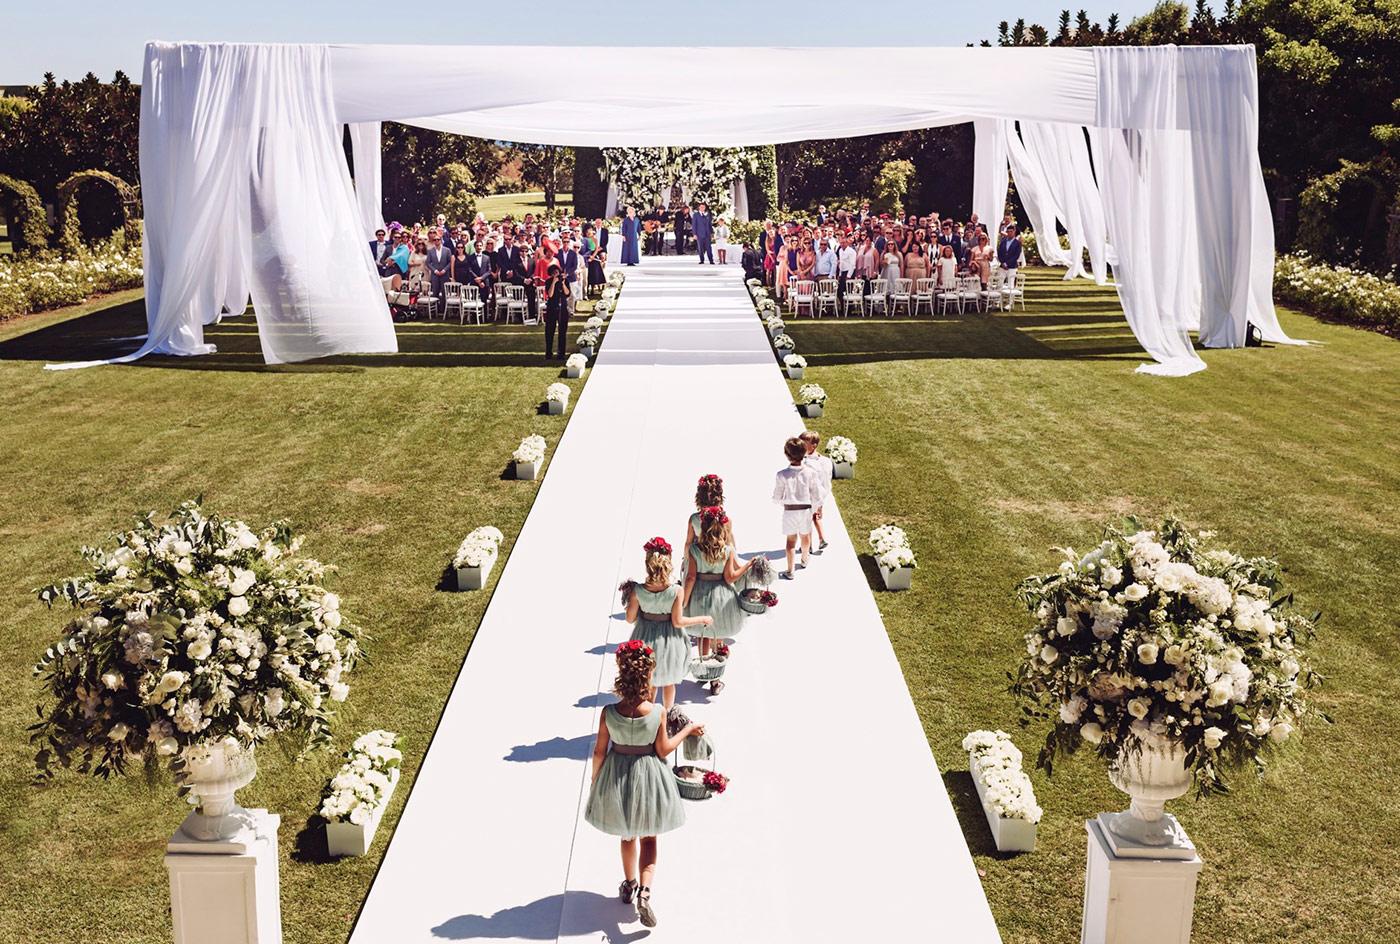 Organización de boda exclusiva en finca